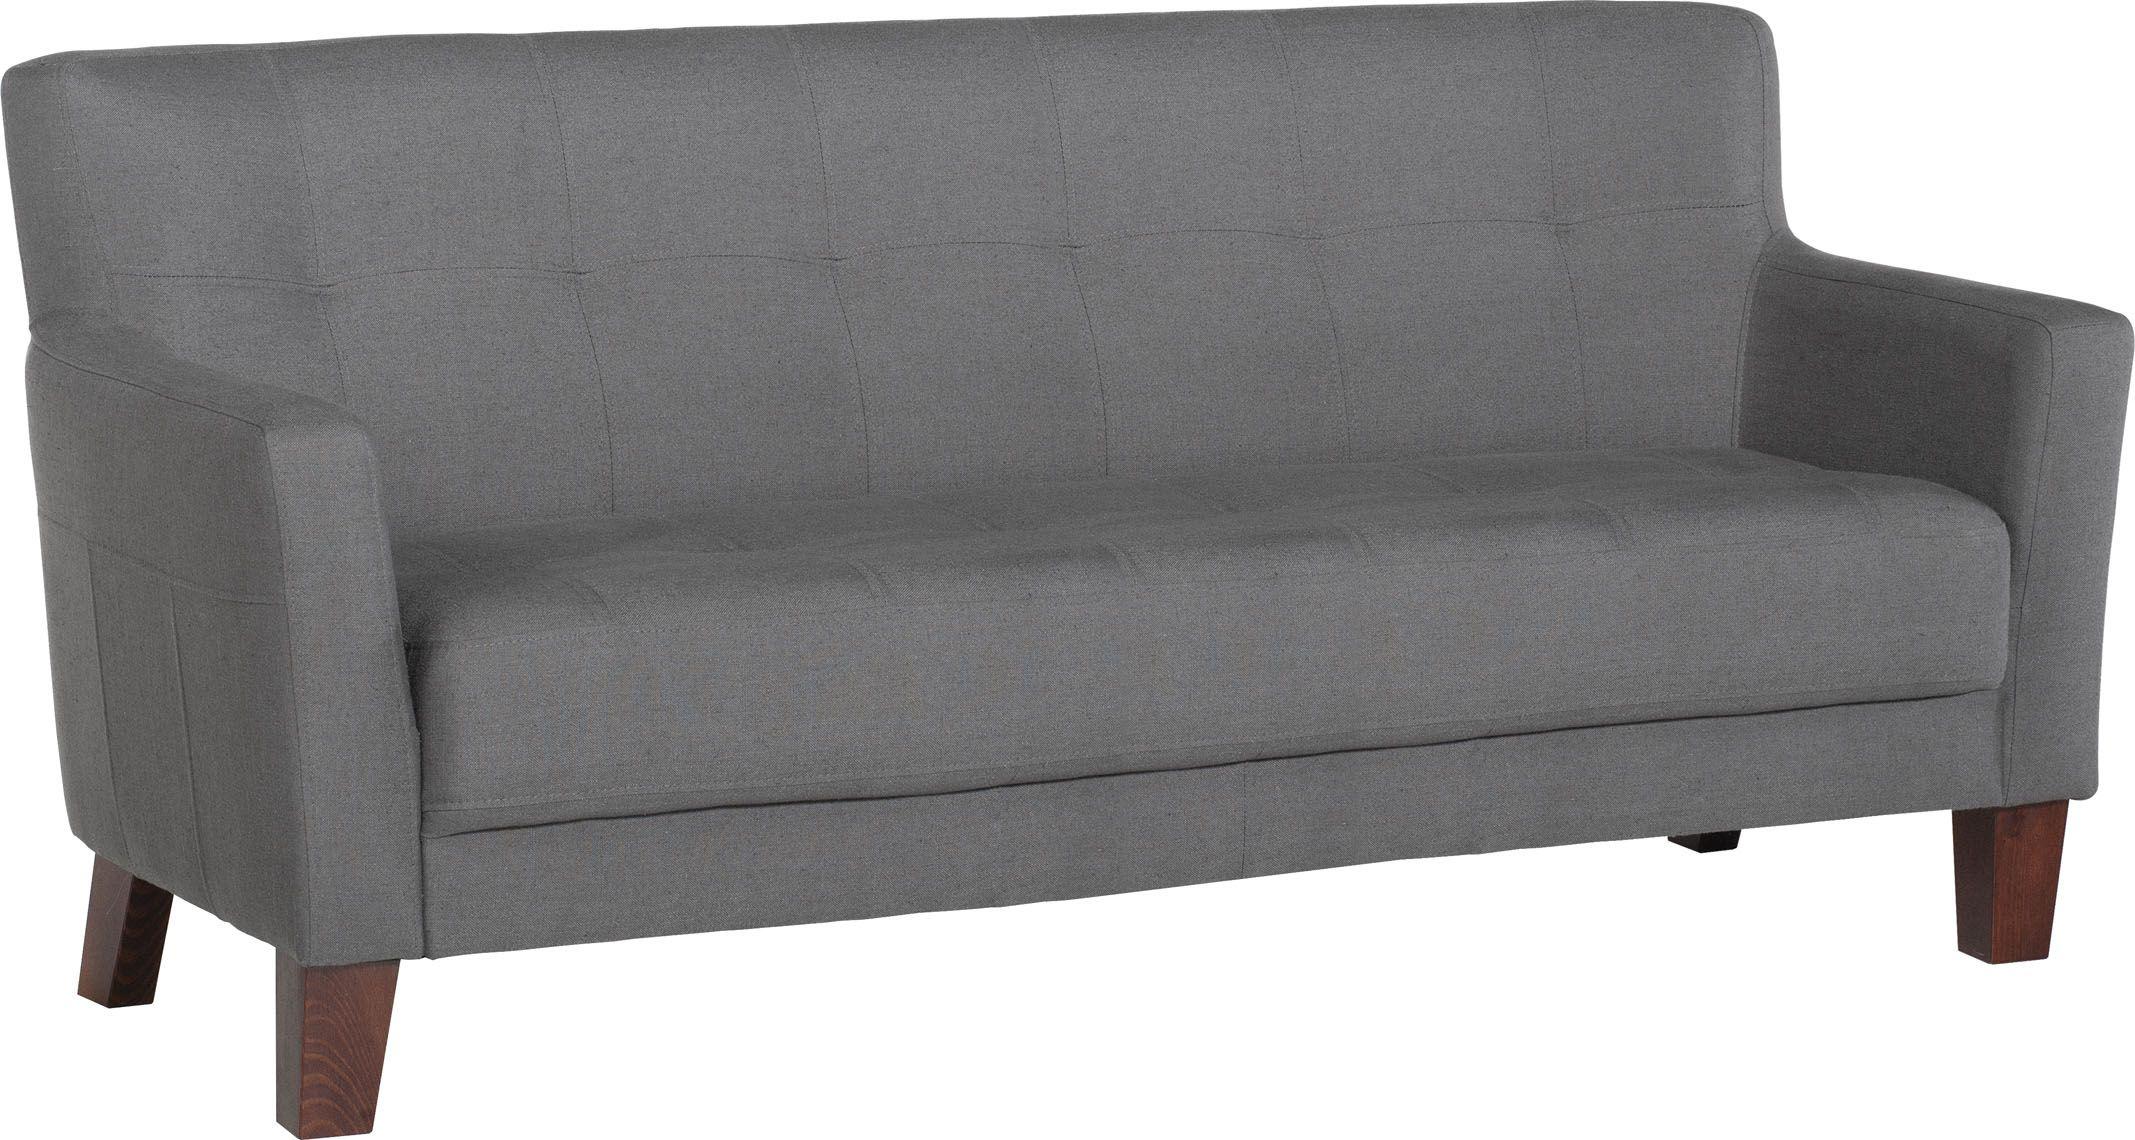 Sofa 3 Osobowa Roce Wnętrza Skandi Meble Wnętrza I